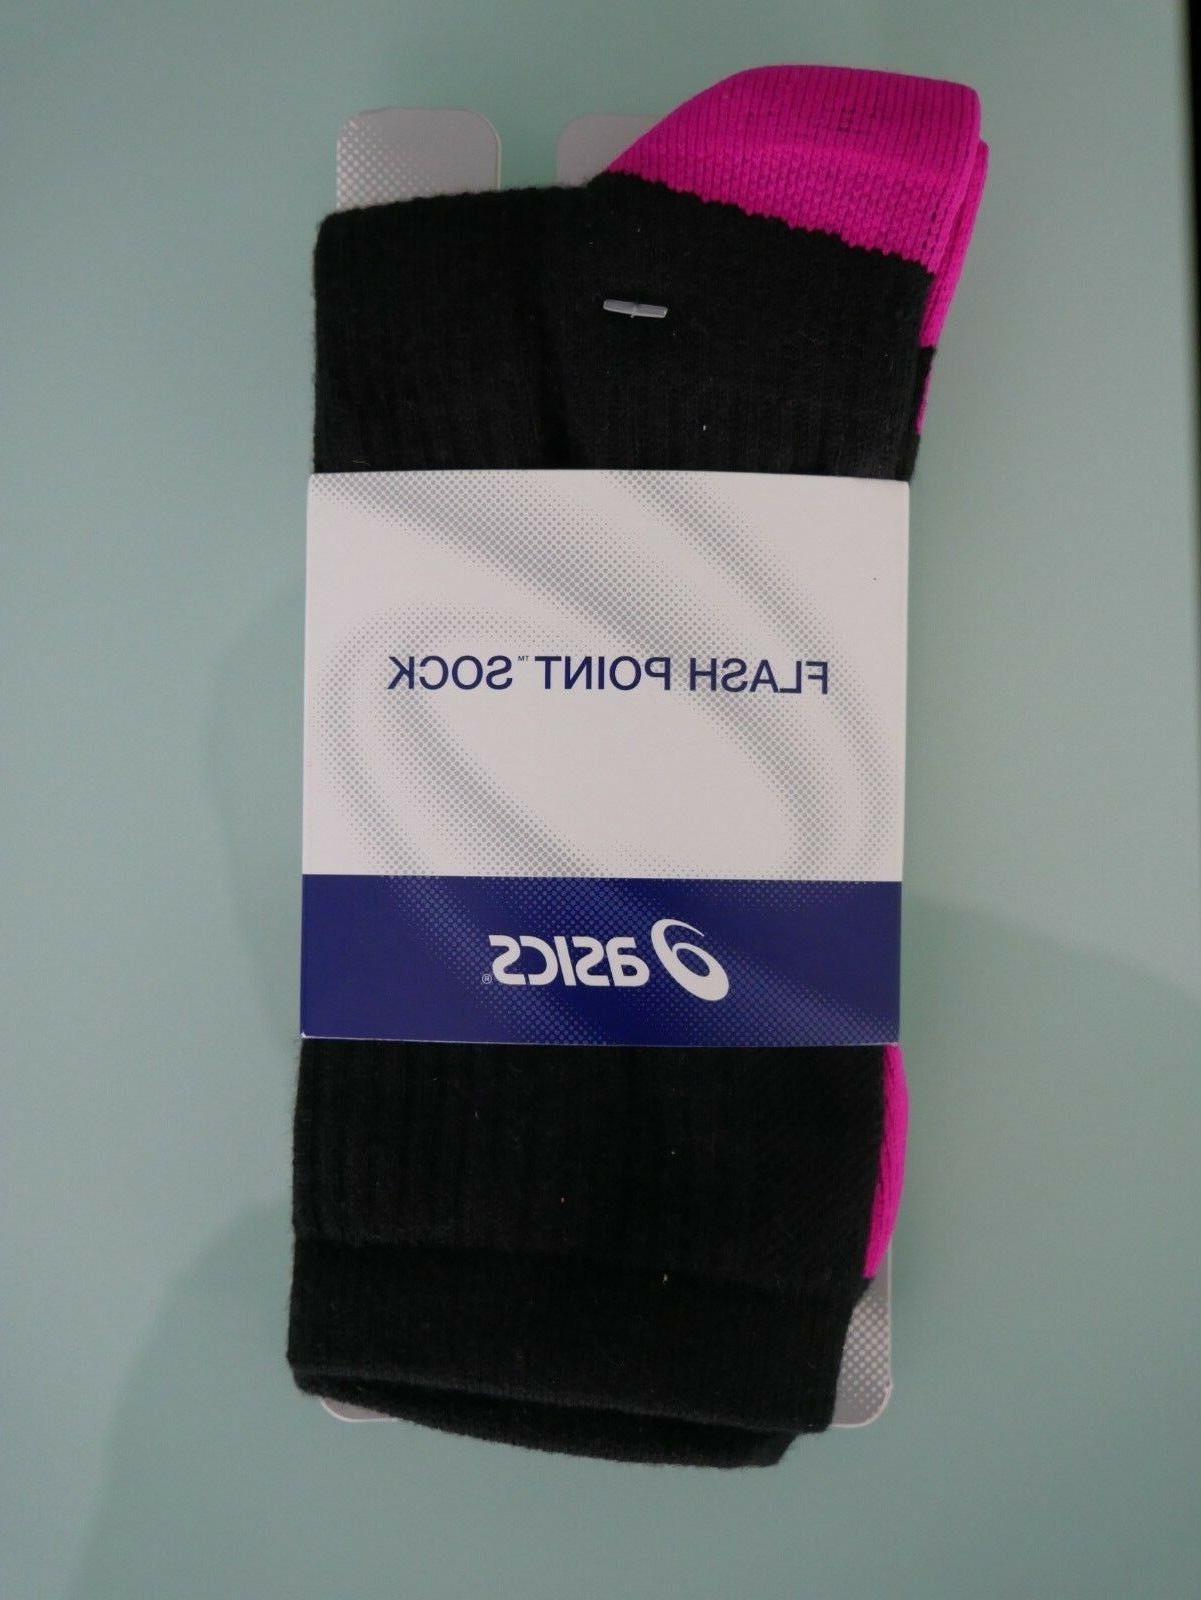 ASICS Flash Point Socks, Black/Pink Glow, Large